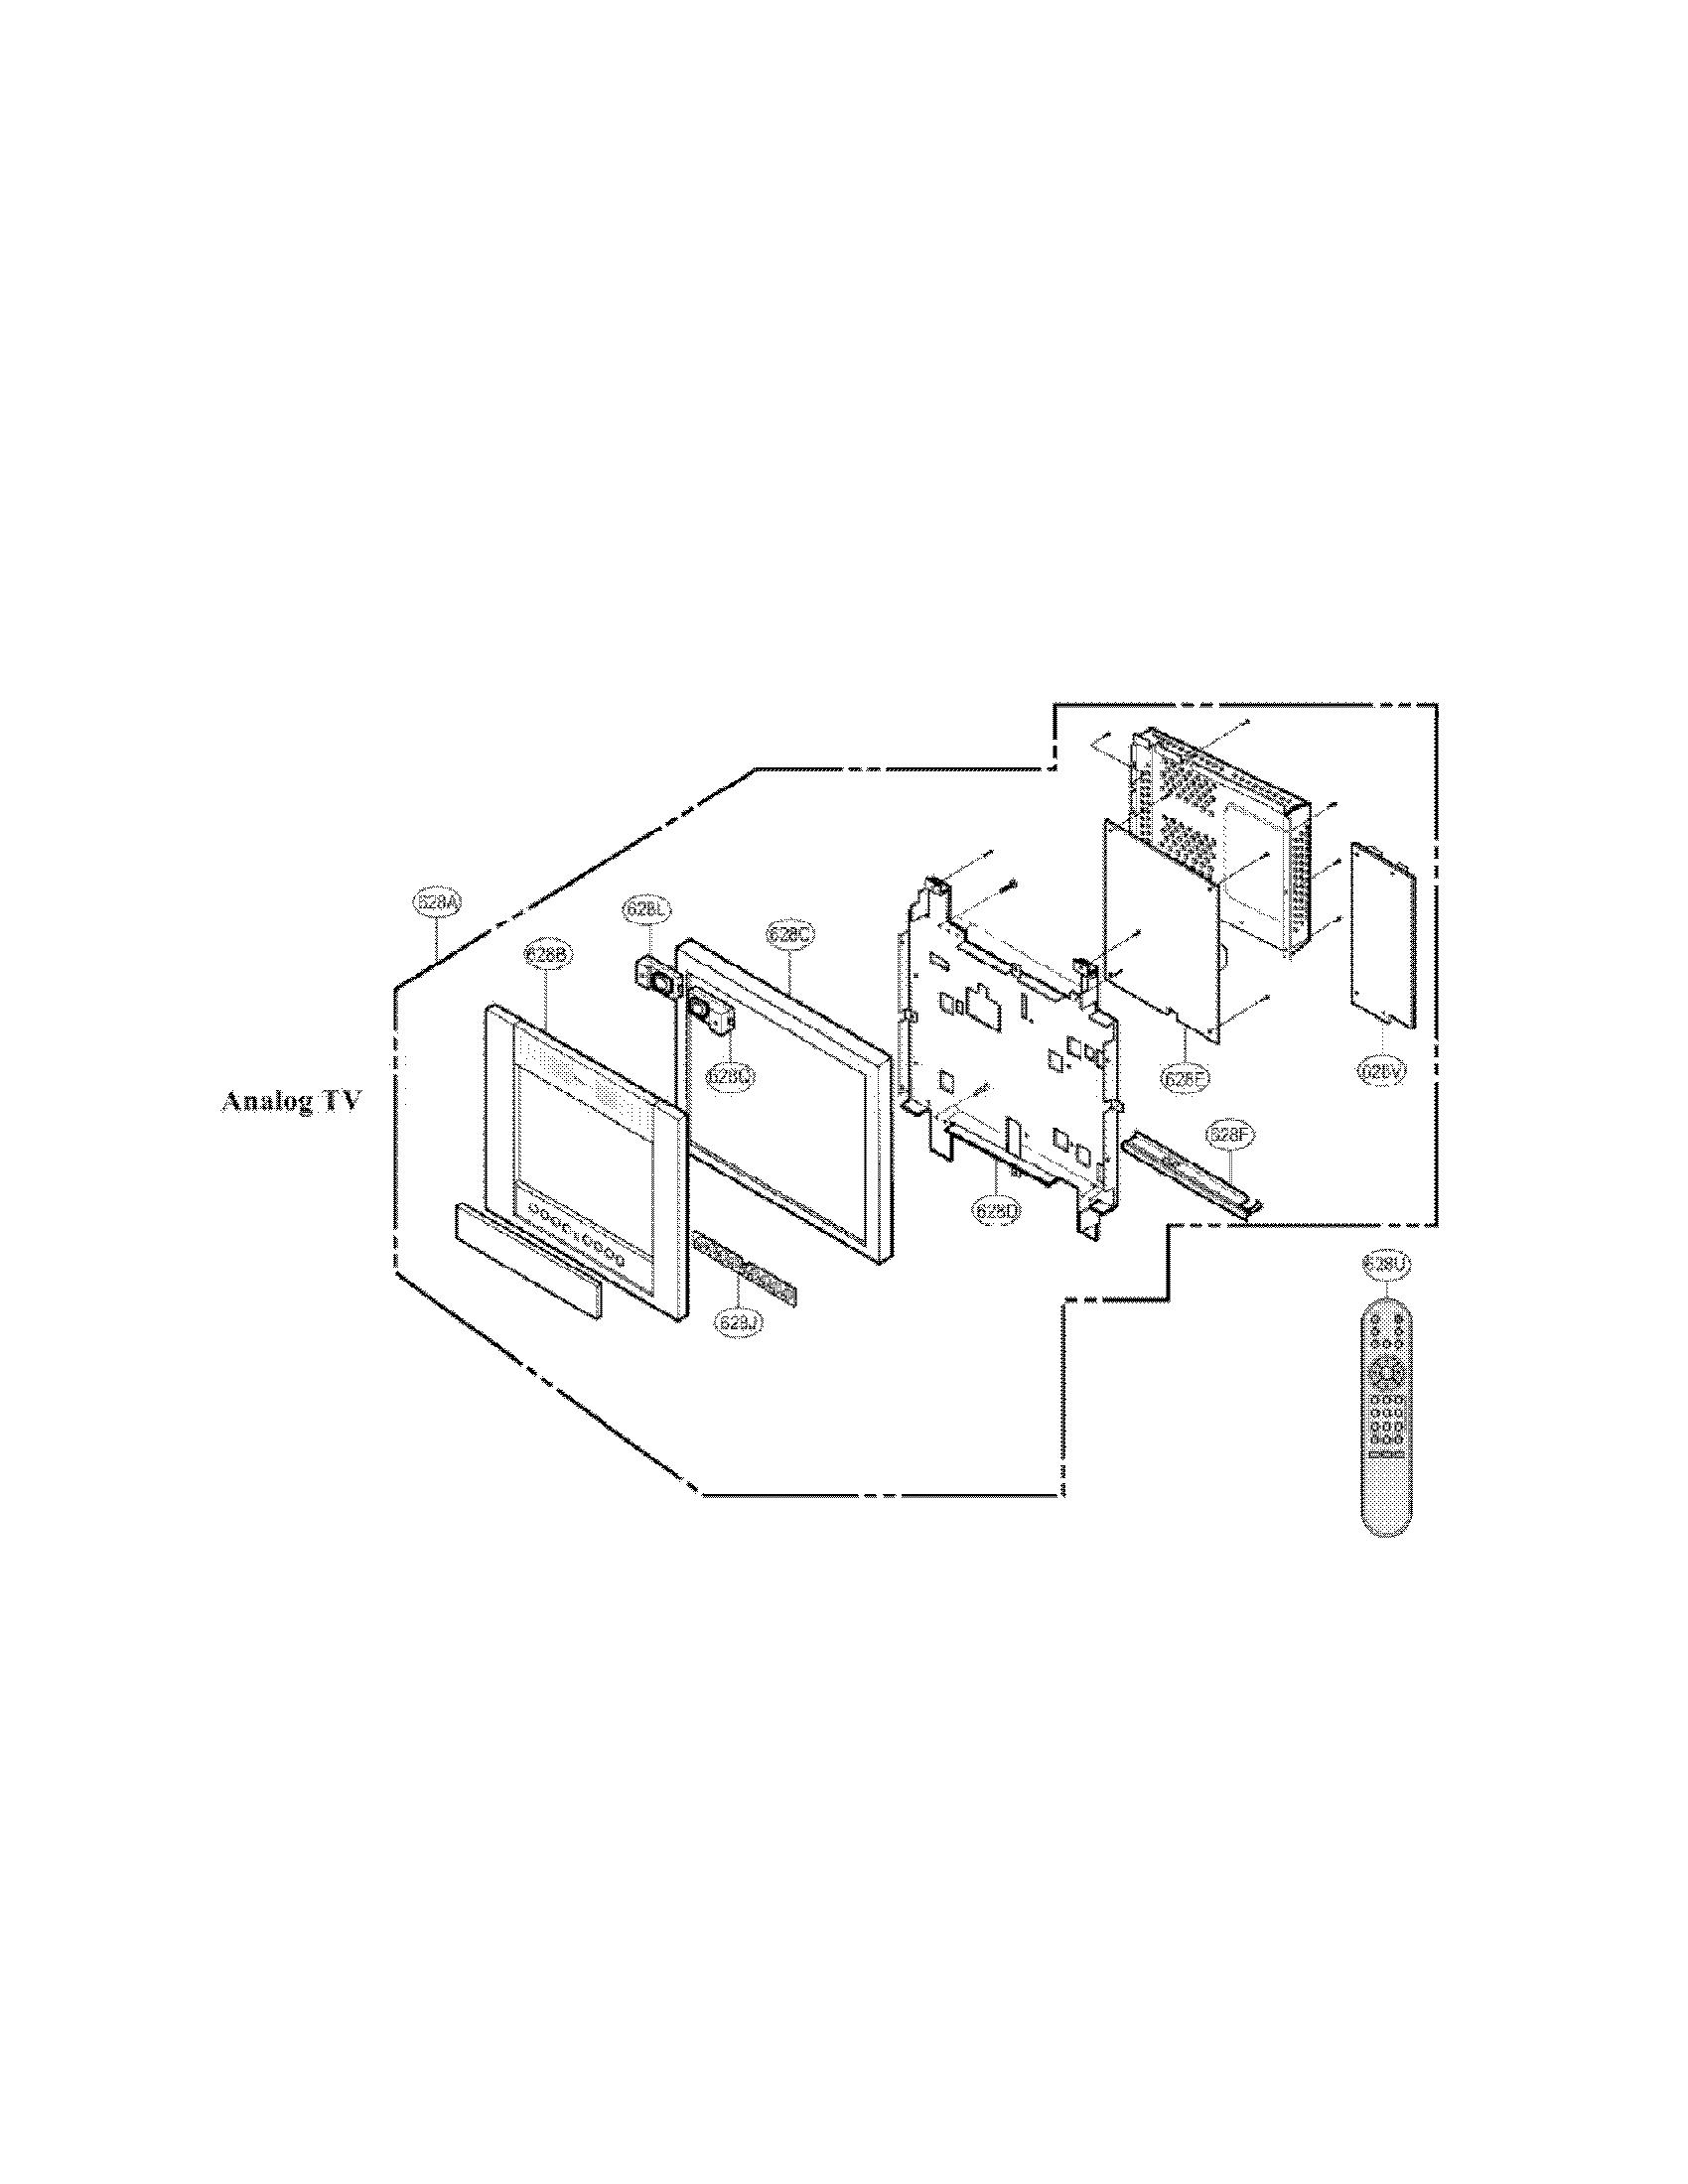 Lg model LSC27990TT side-by-side refrigerator genuine parts